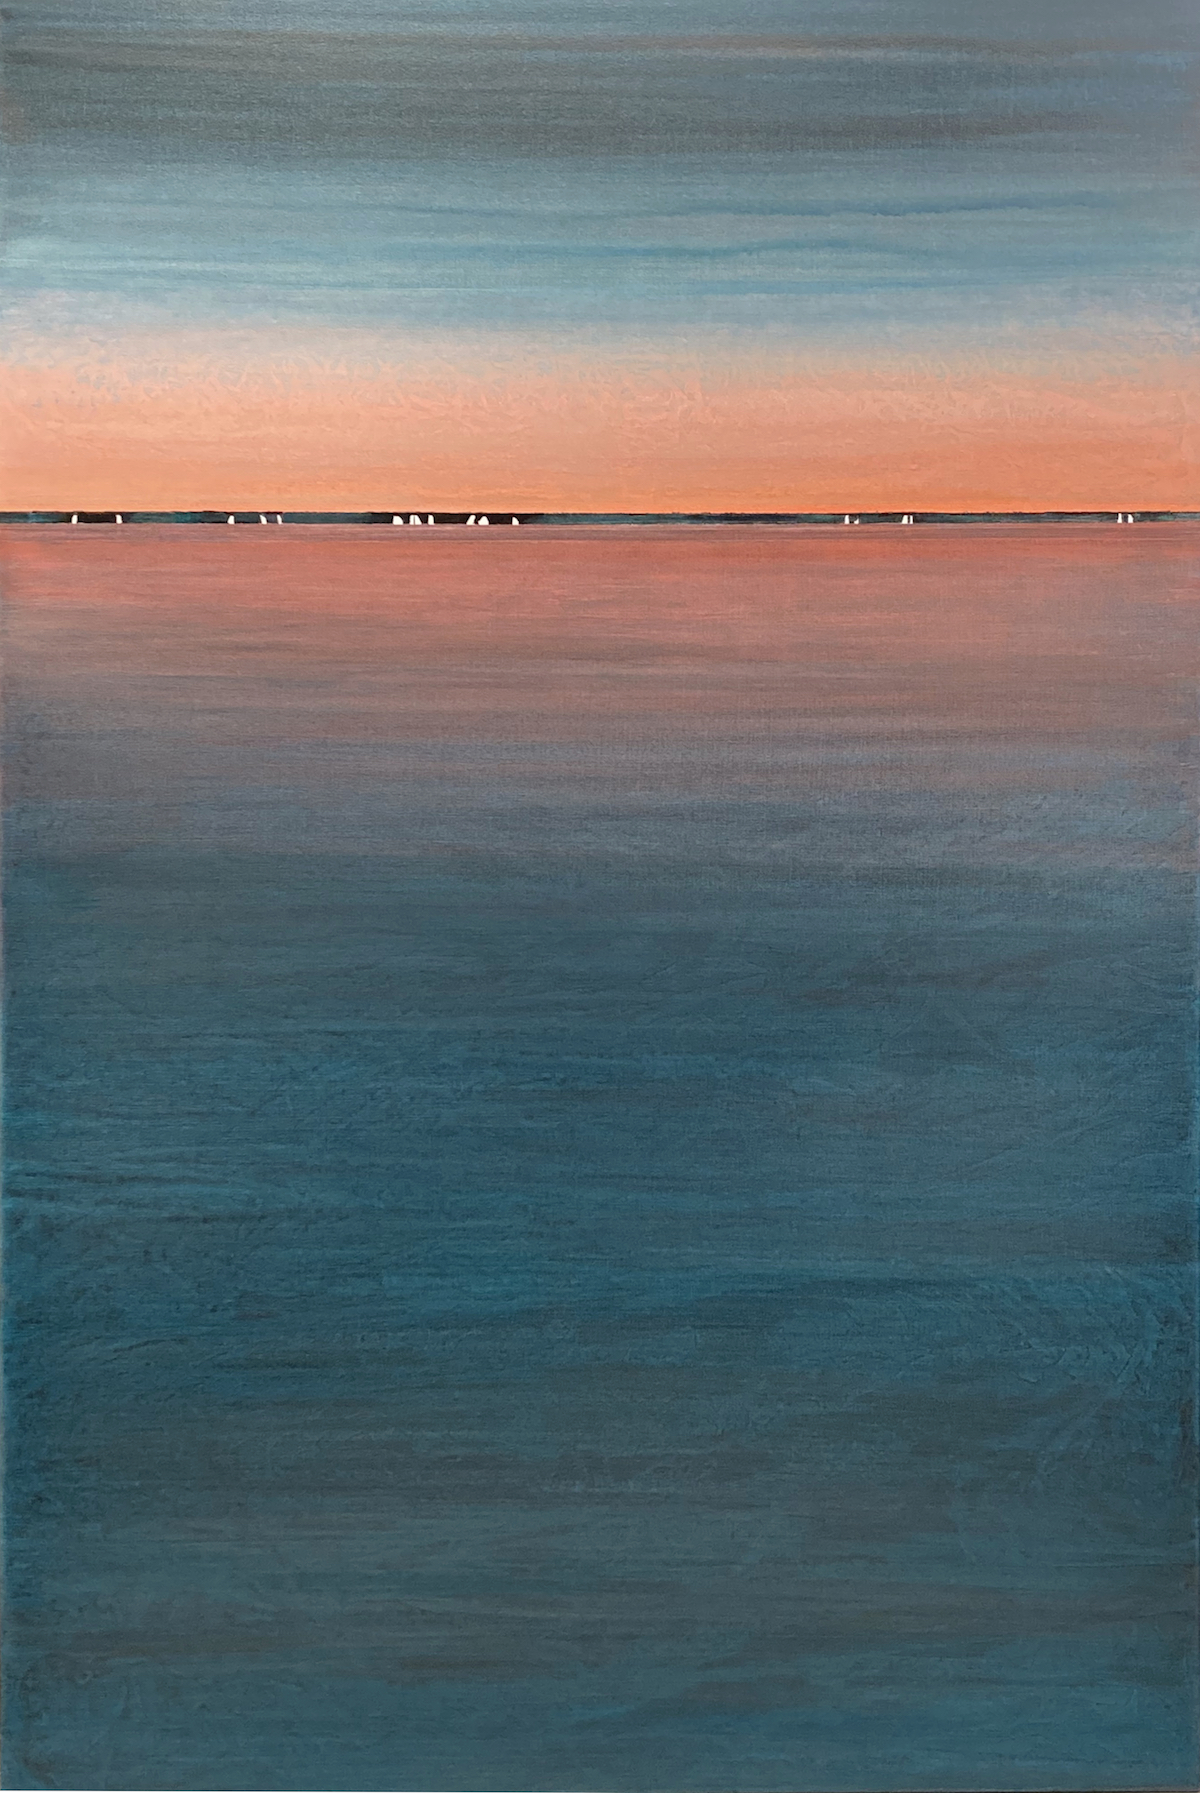 """A Distant Shore"" 60x40, acrylic on canvas"